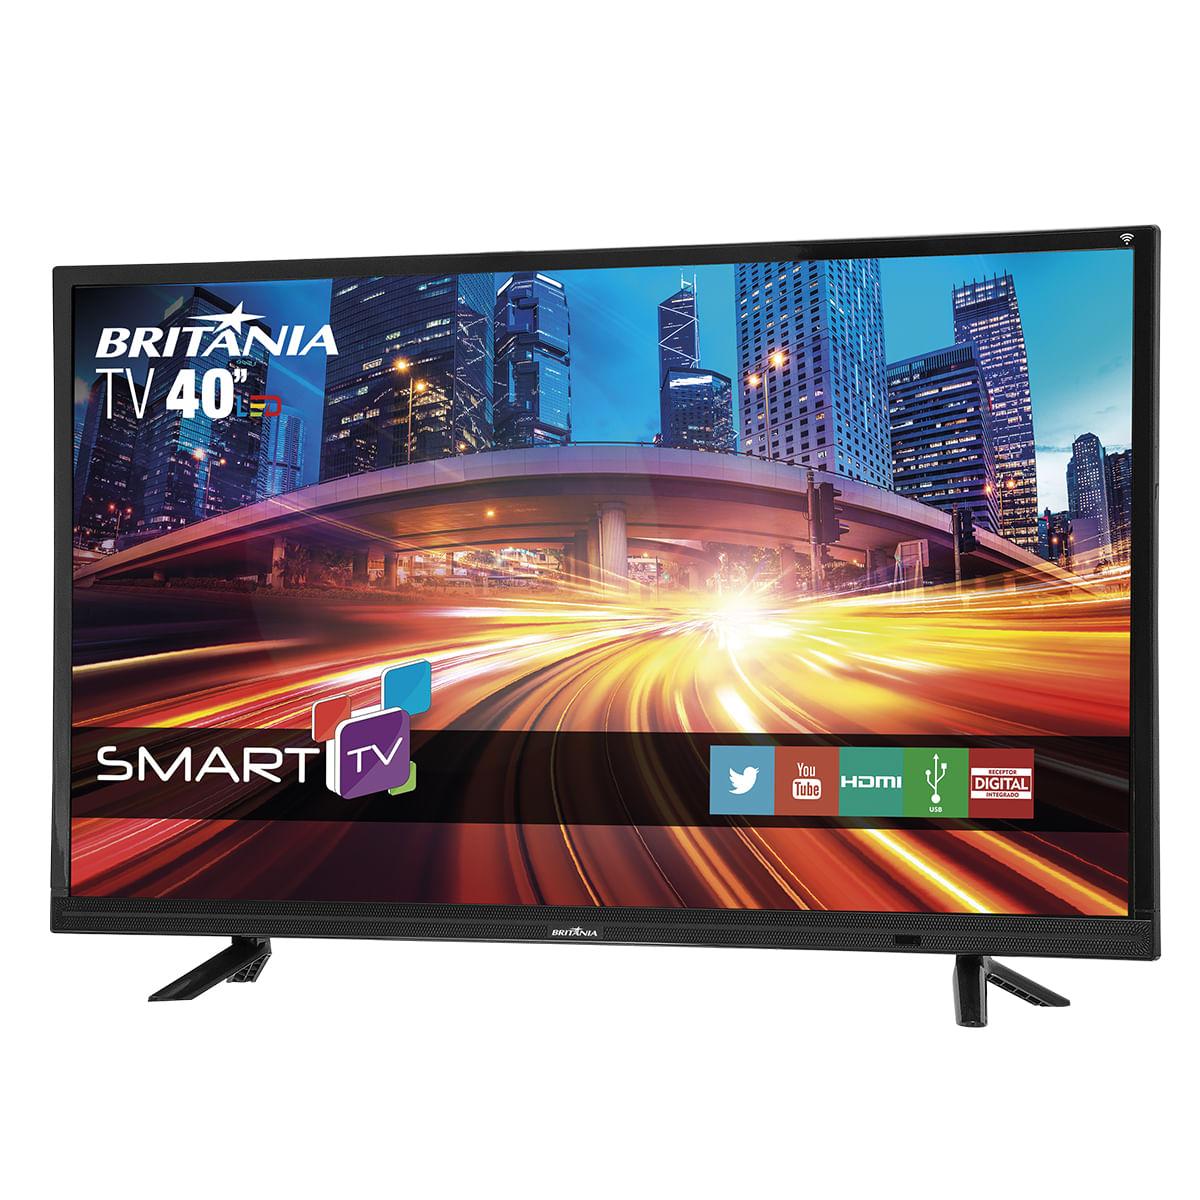 Smart TV Britânia 40 polegadas Full HD com Netflix